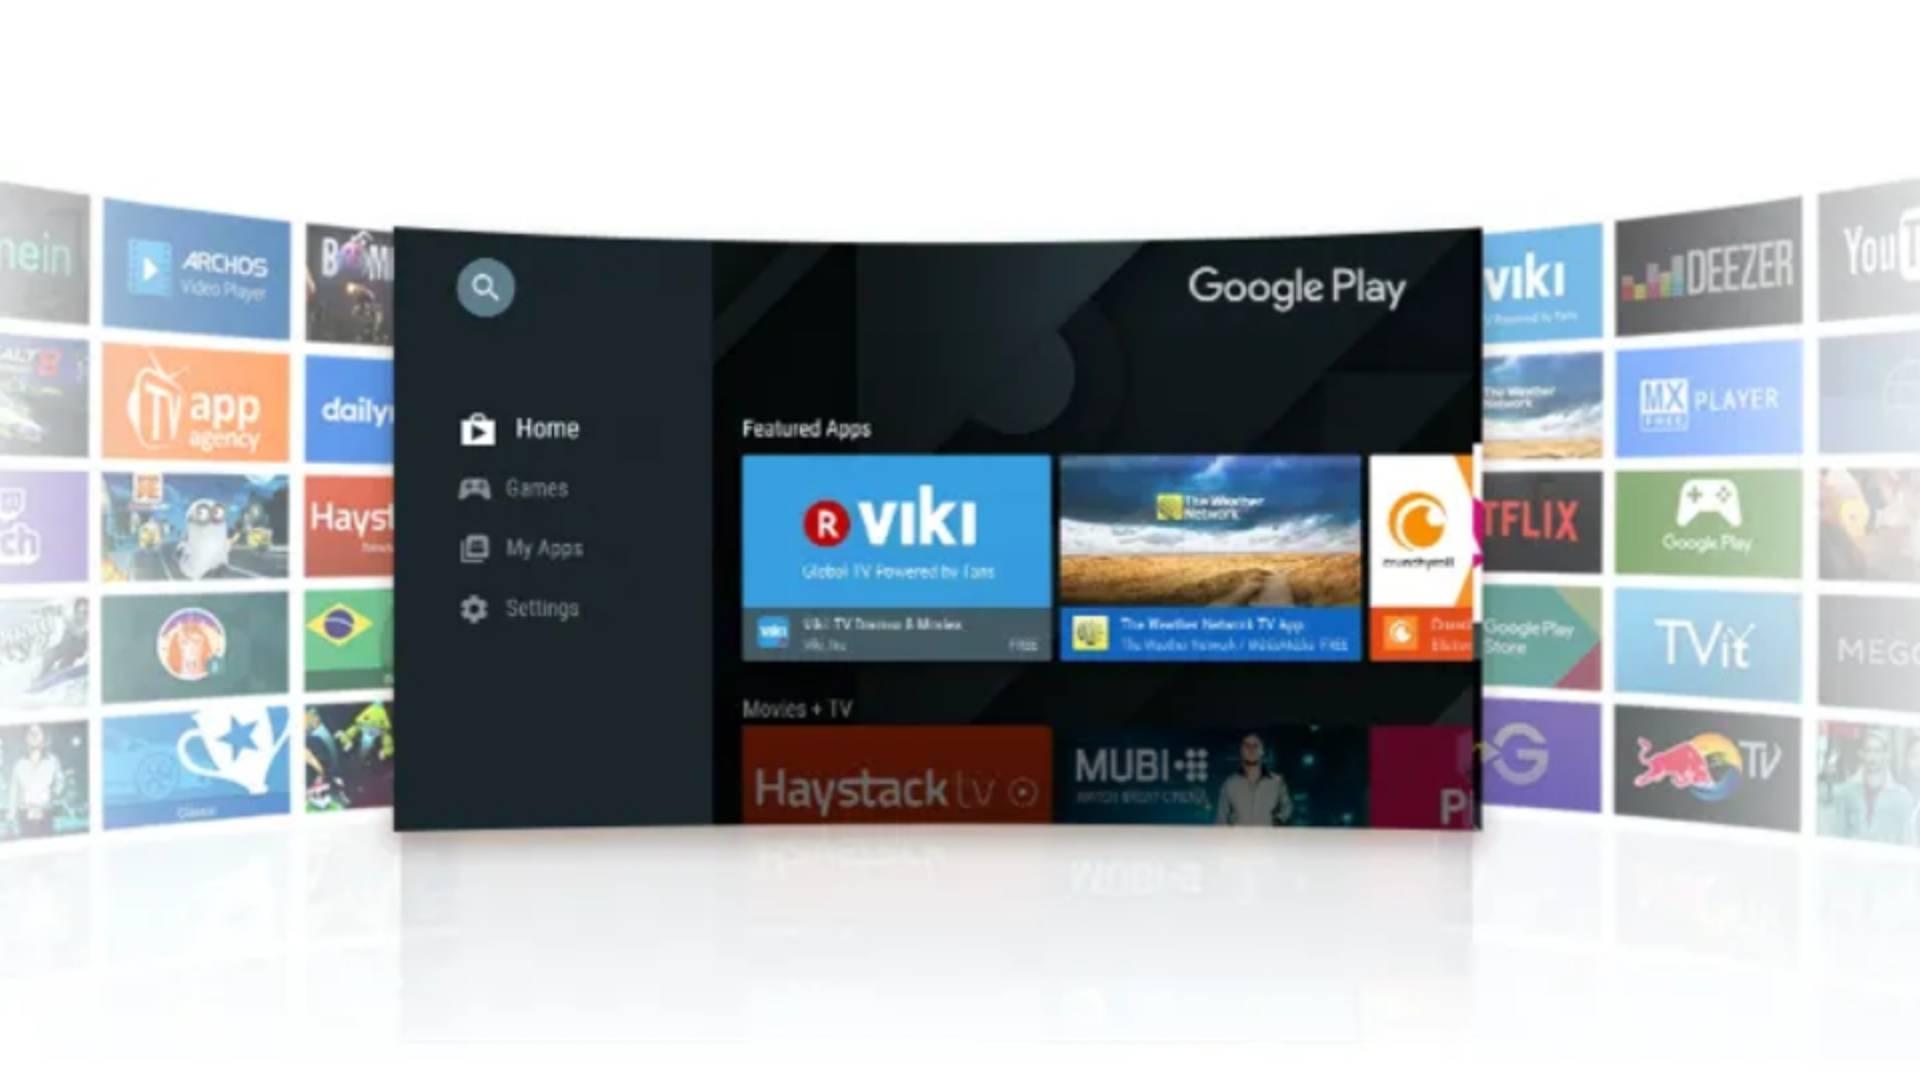 TCL Smart LED TV google play